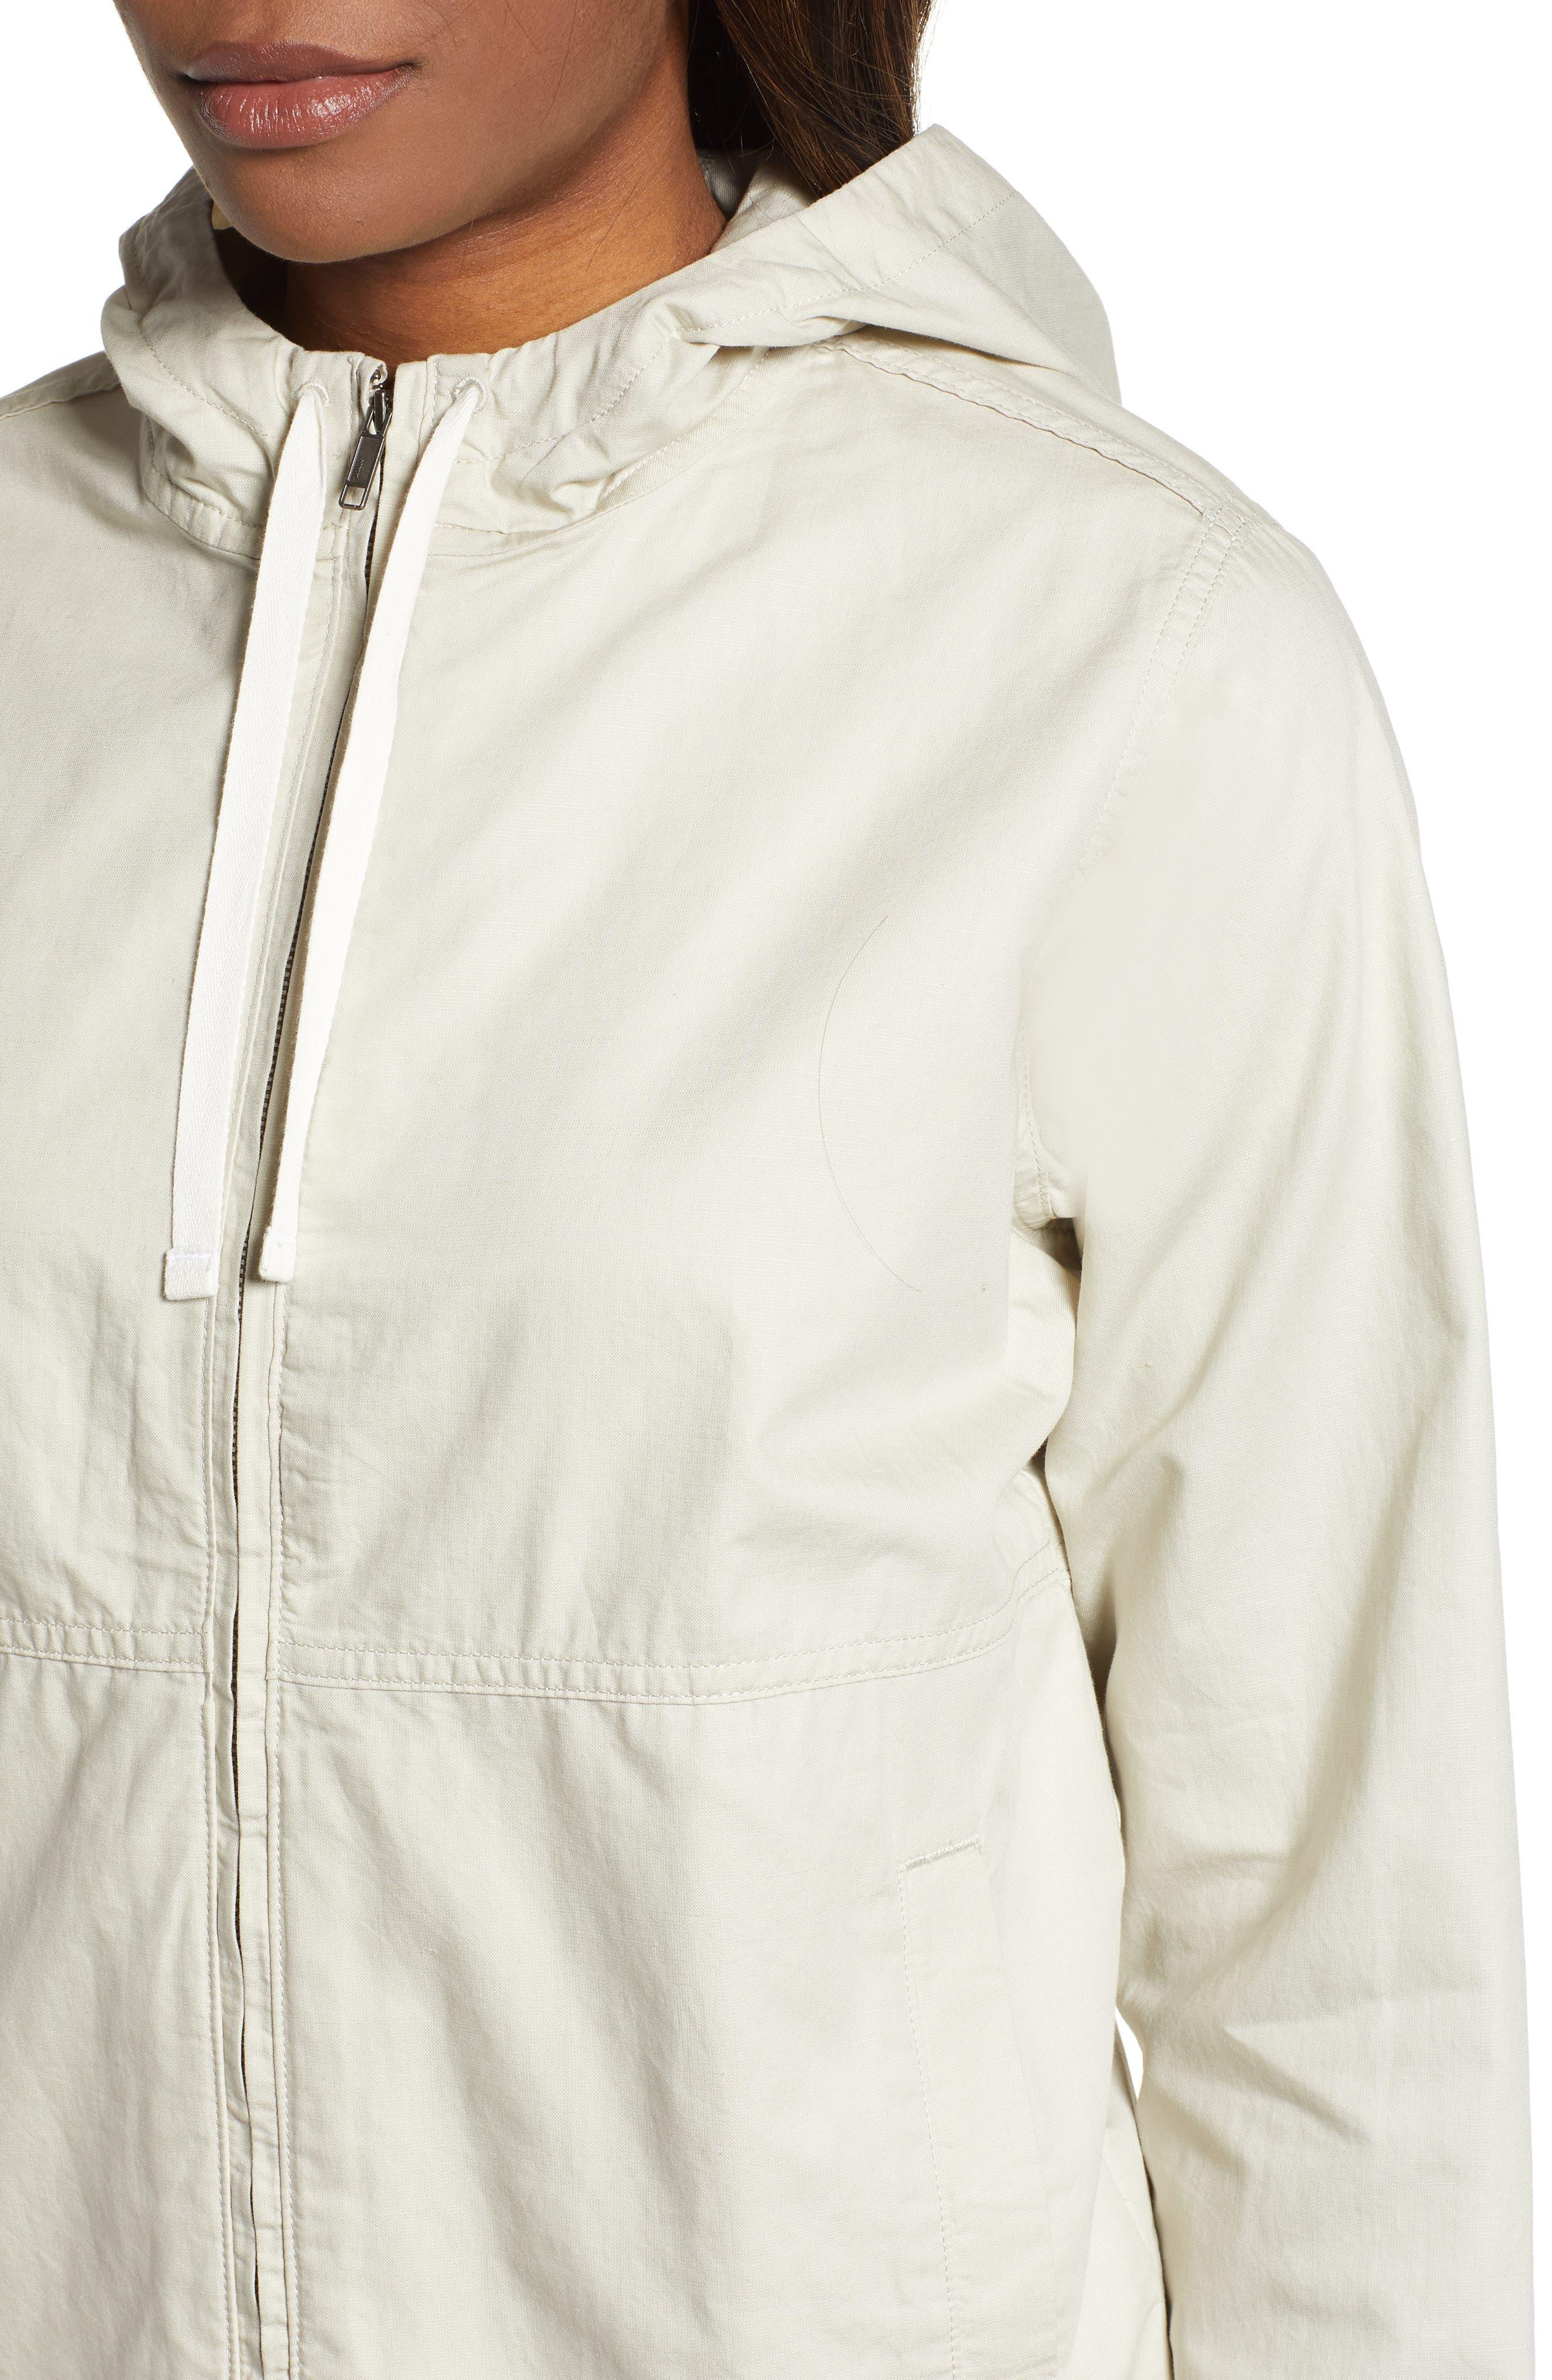 PATAGONIA, Back Canyon Hooded Jacket, Alternate thumbnail 4, color, PELICAN